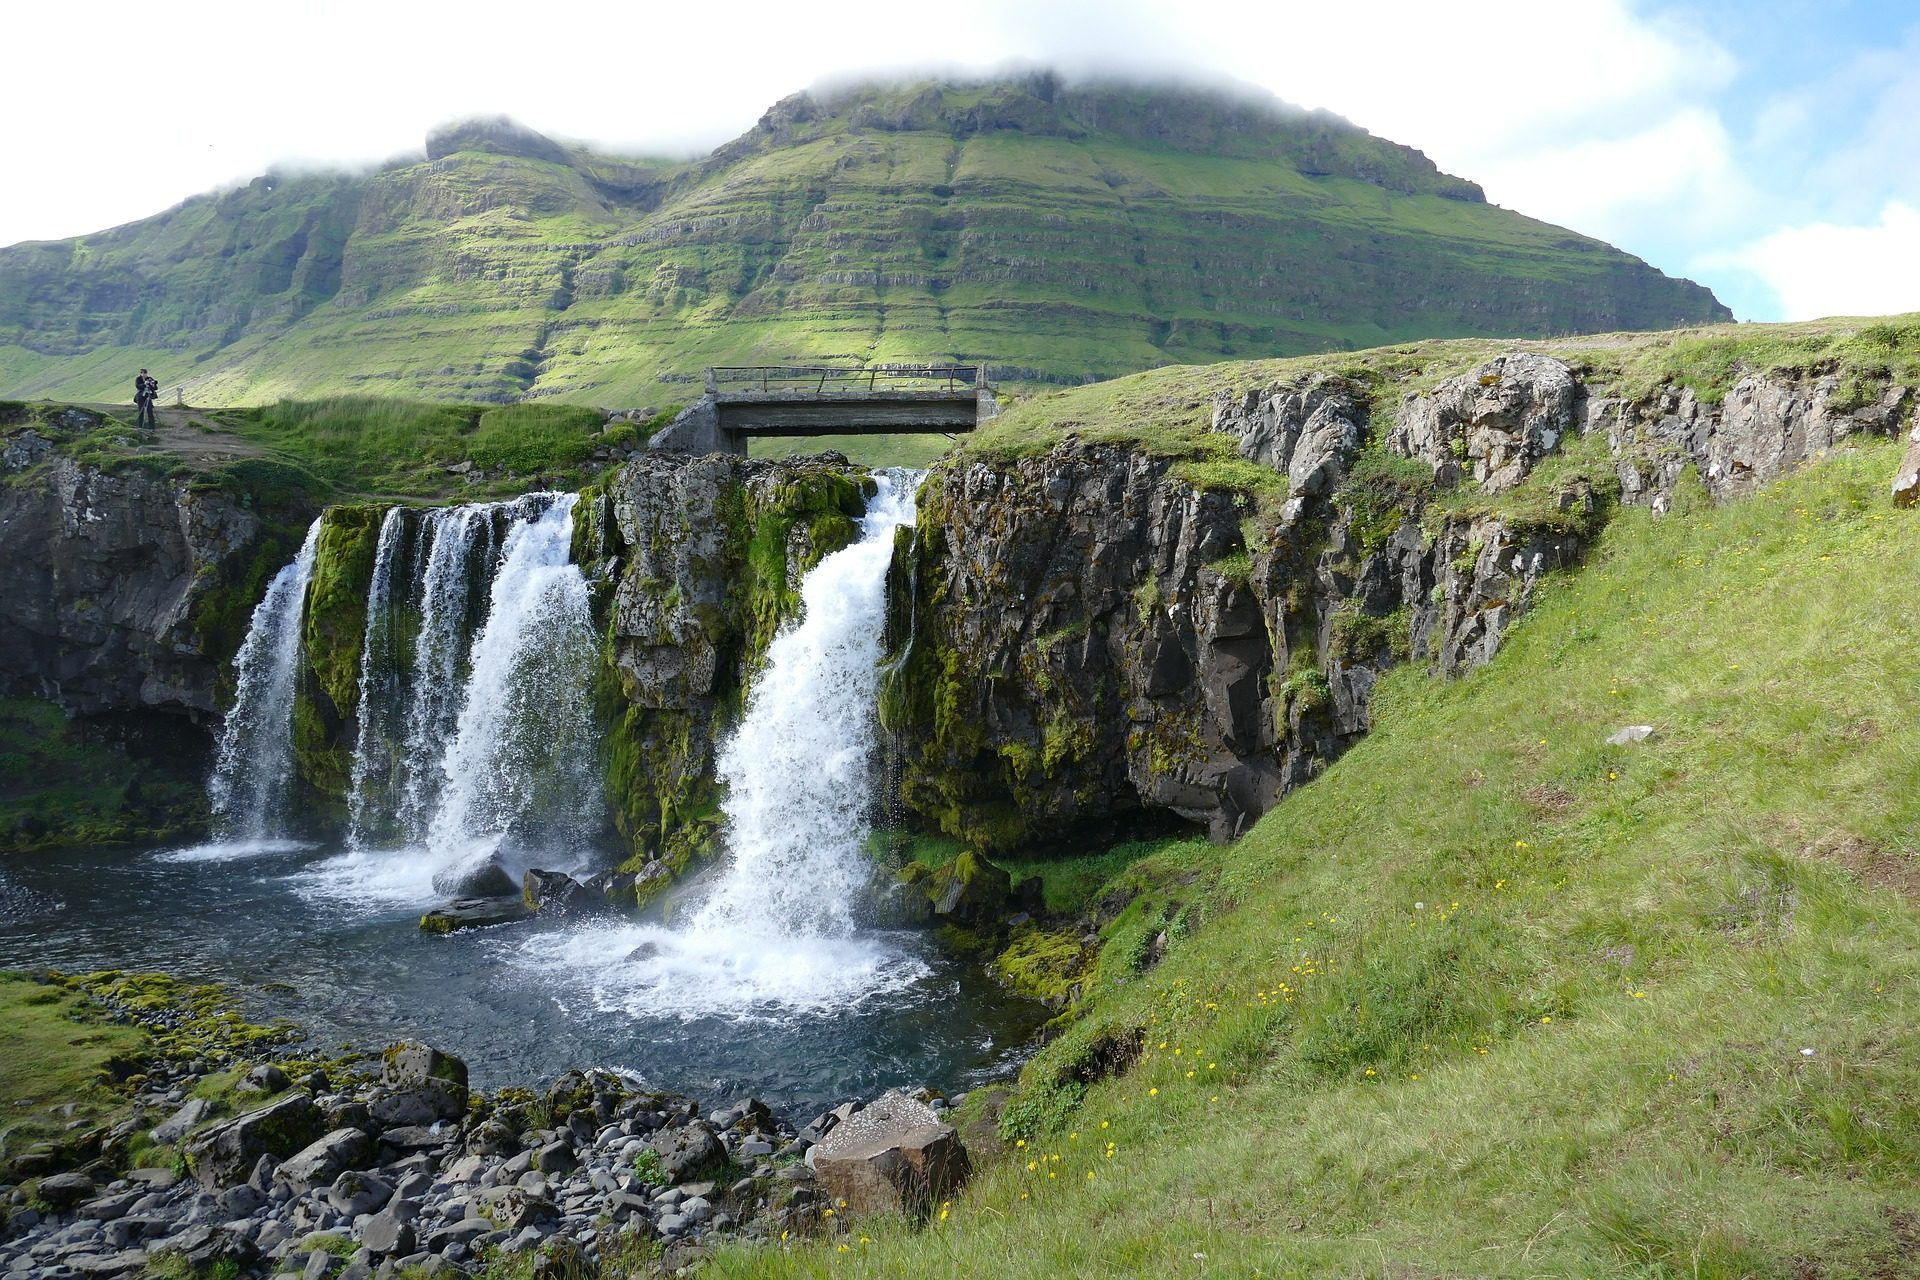 agua, río, cataratas, cascada, montañas, snaefellness, islandia - Fondos de Pantalla HD - professor-falken.com